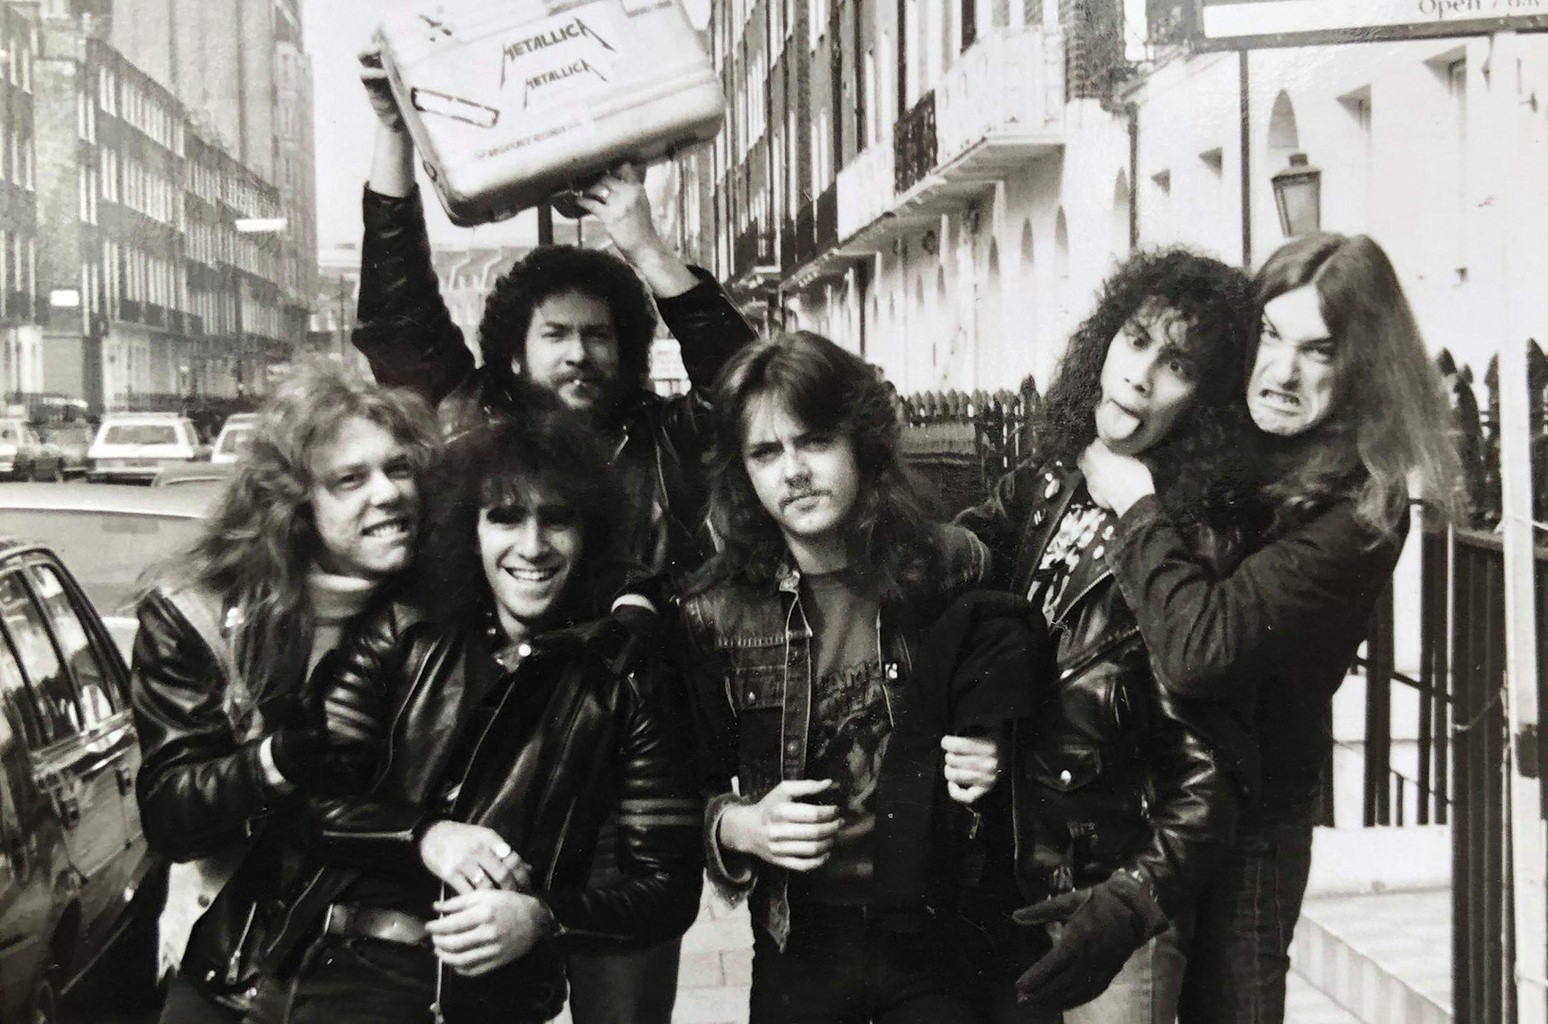 Jon Zazula and Metallica